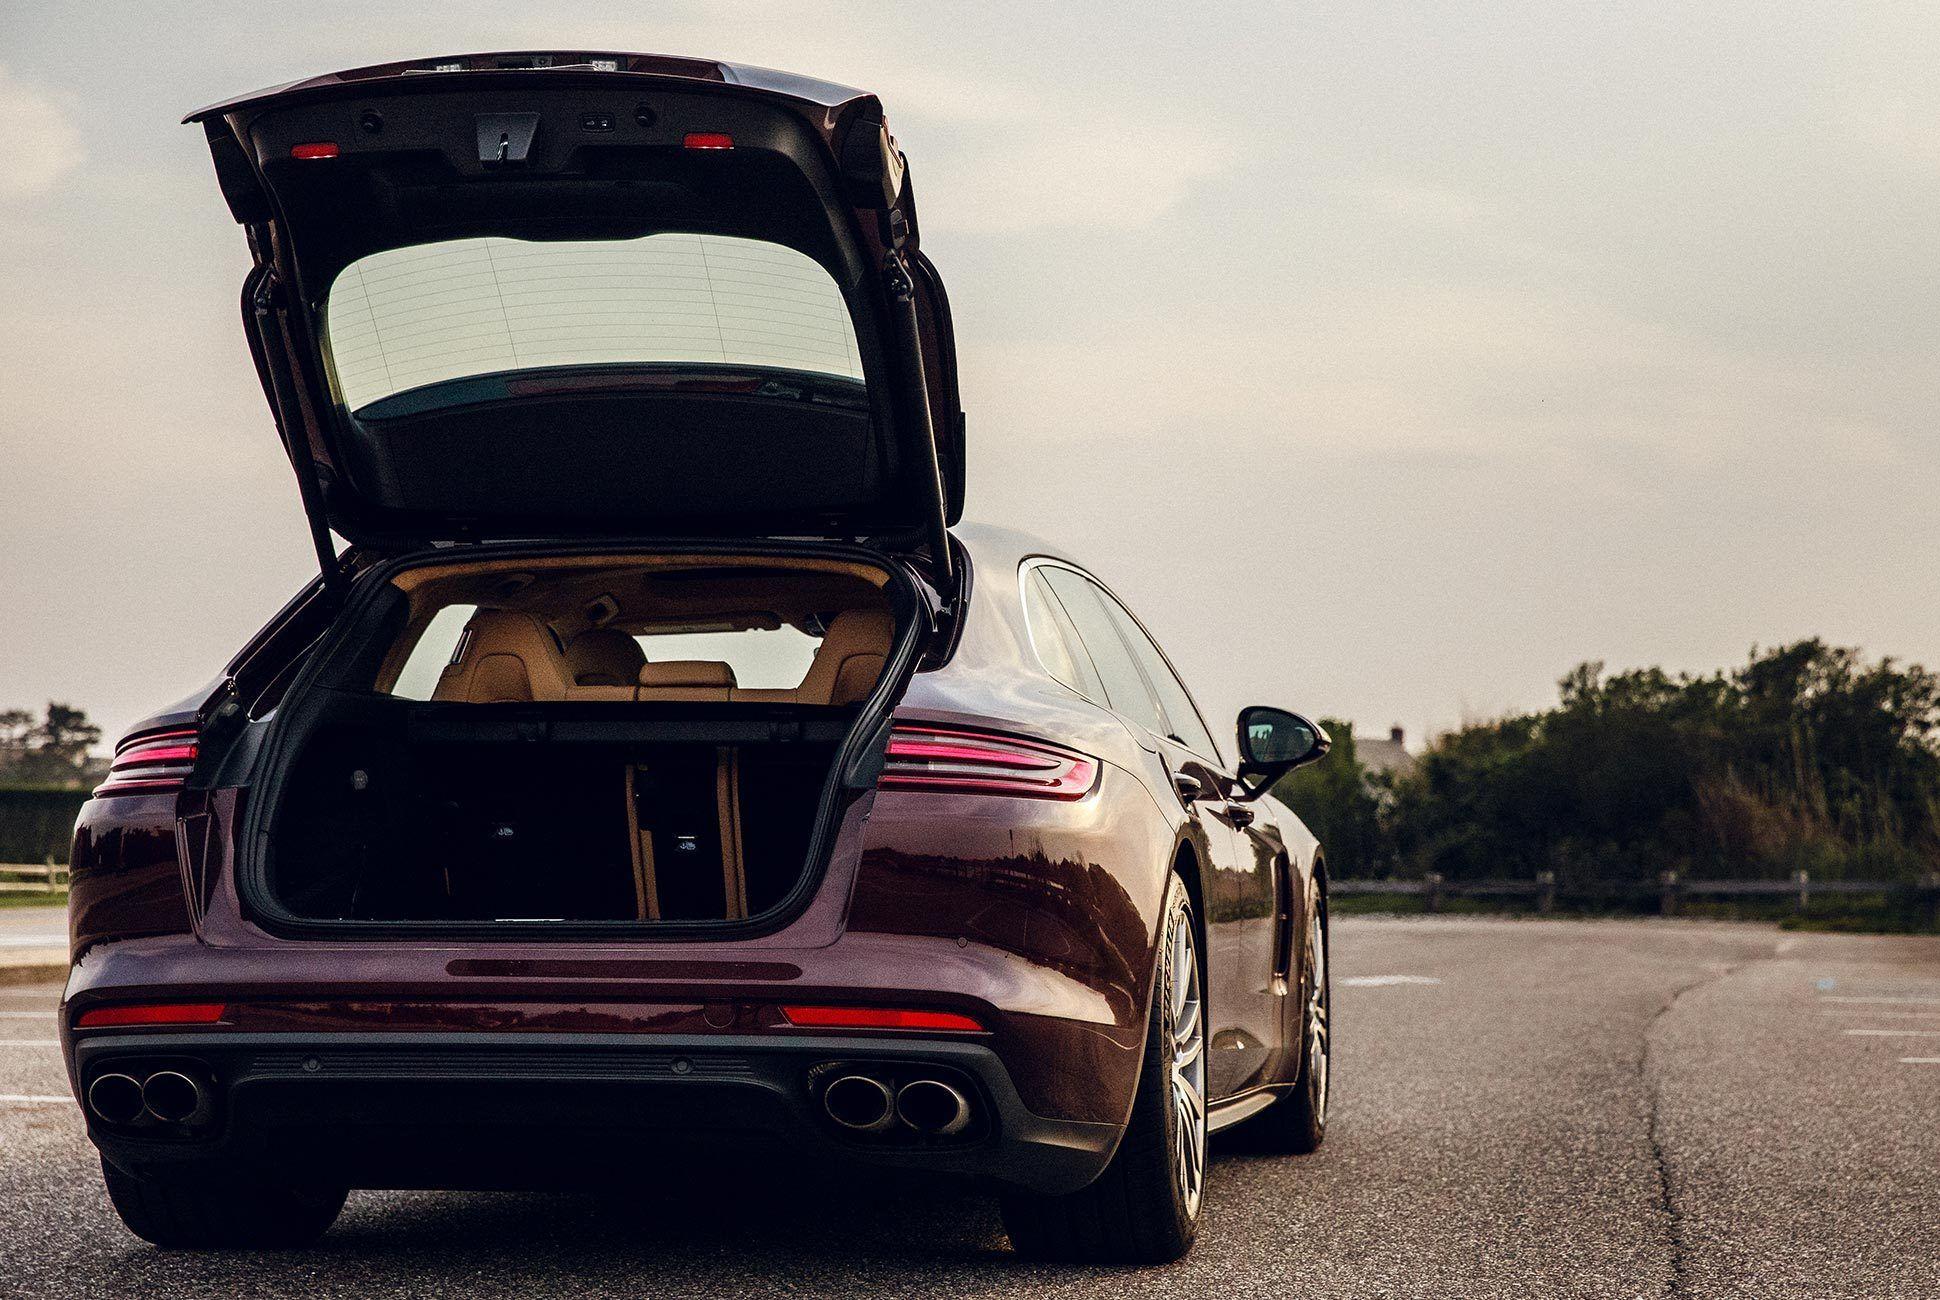 Porsche-Panamera-Turbo-Sport-Turismo-Review-gear-patrol-slide-8